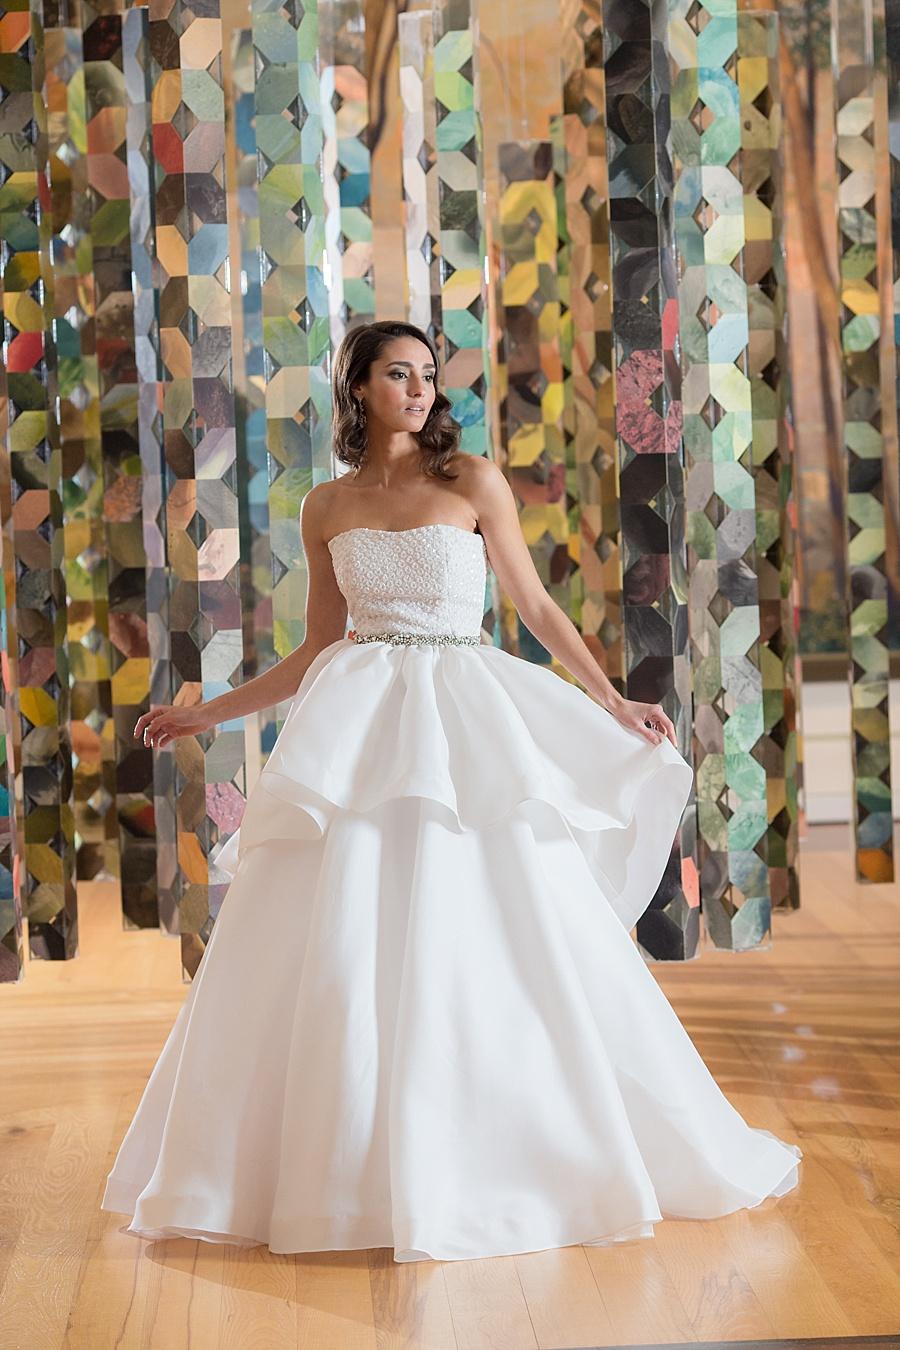 Vanessa_Joy_Photography_Details_of_I_do_Jean_Ralph_Thurin_Wedding_Gowns_April_Lynn_Designs_Wedding_Stationery1